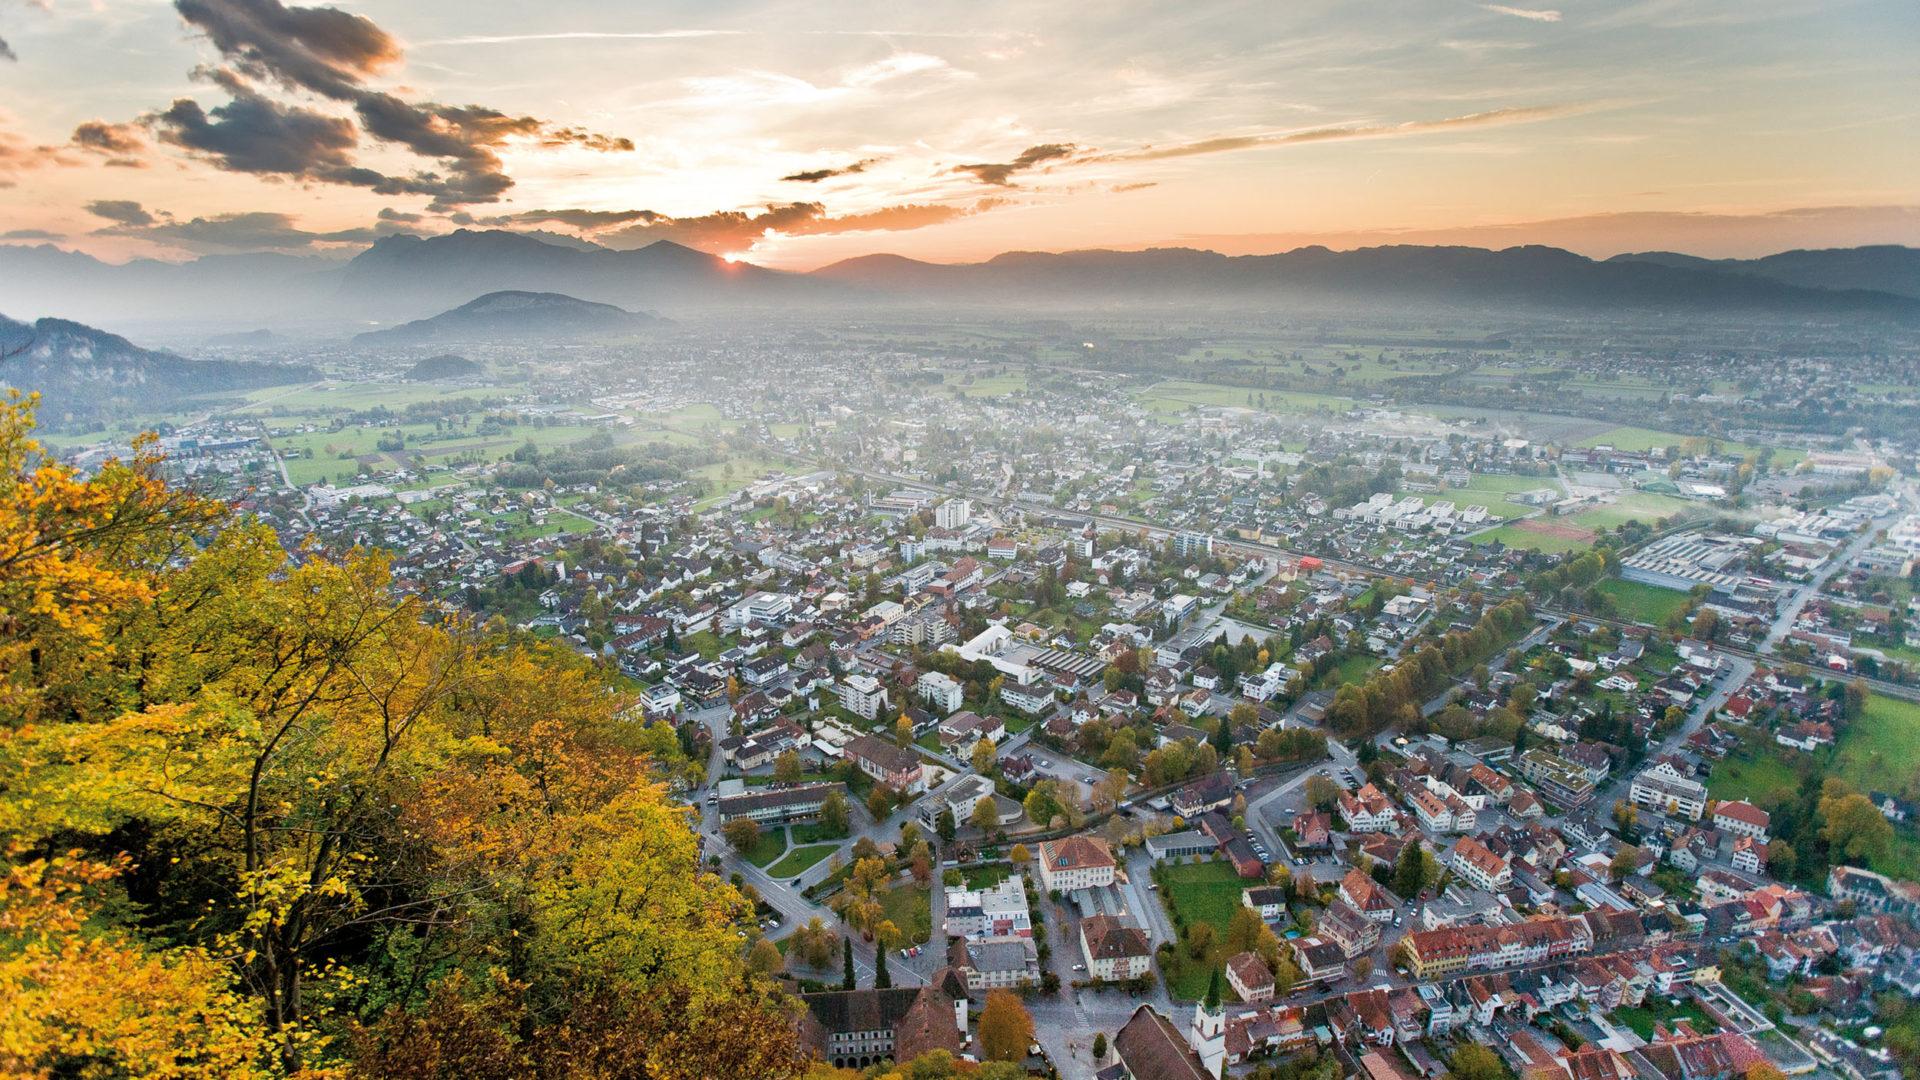 Hohenems, Erlebnis Stadt, Blick vom Schloßberg Richtung Oberland (c) walser-image.com